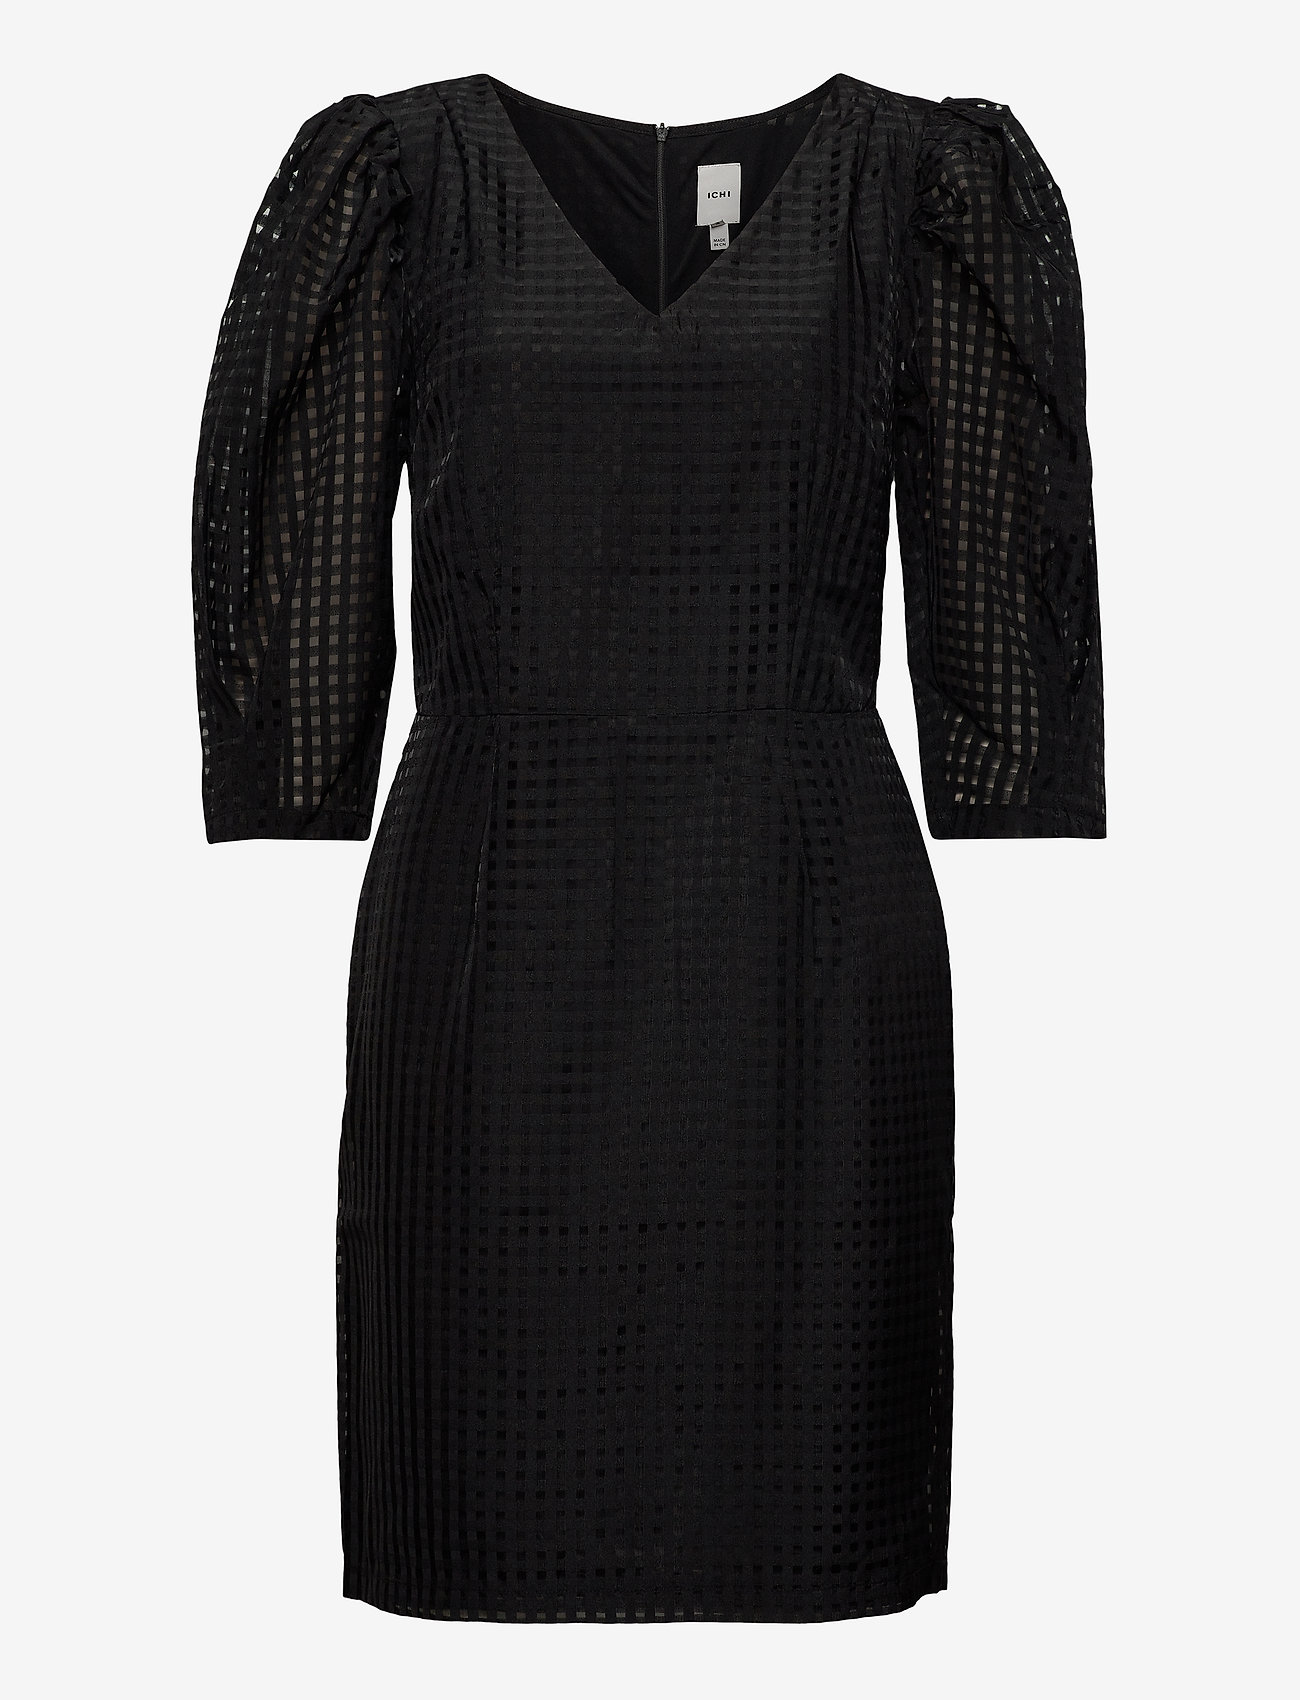 ICHI - IHKAY DR - short dresses - black - 0